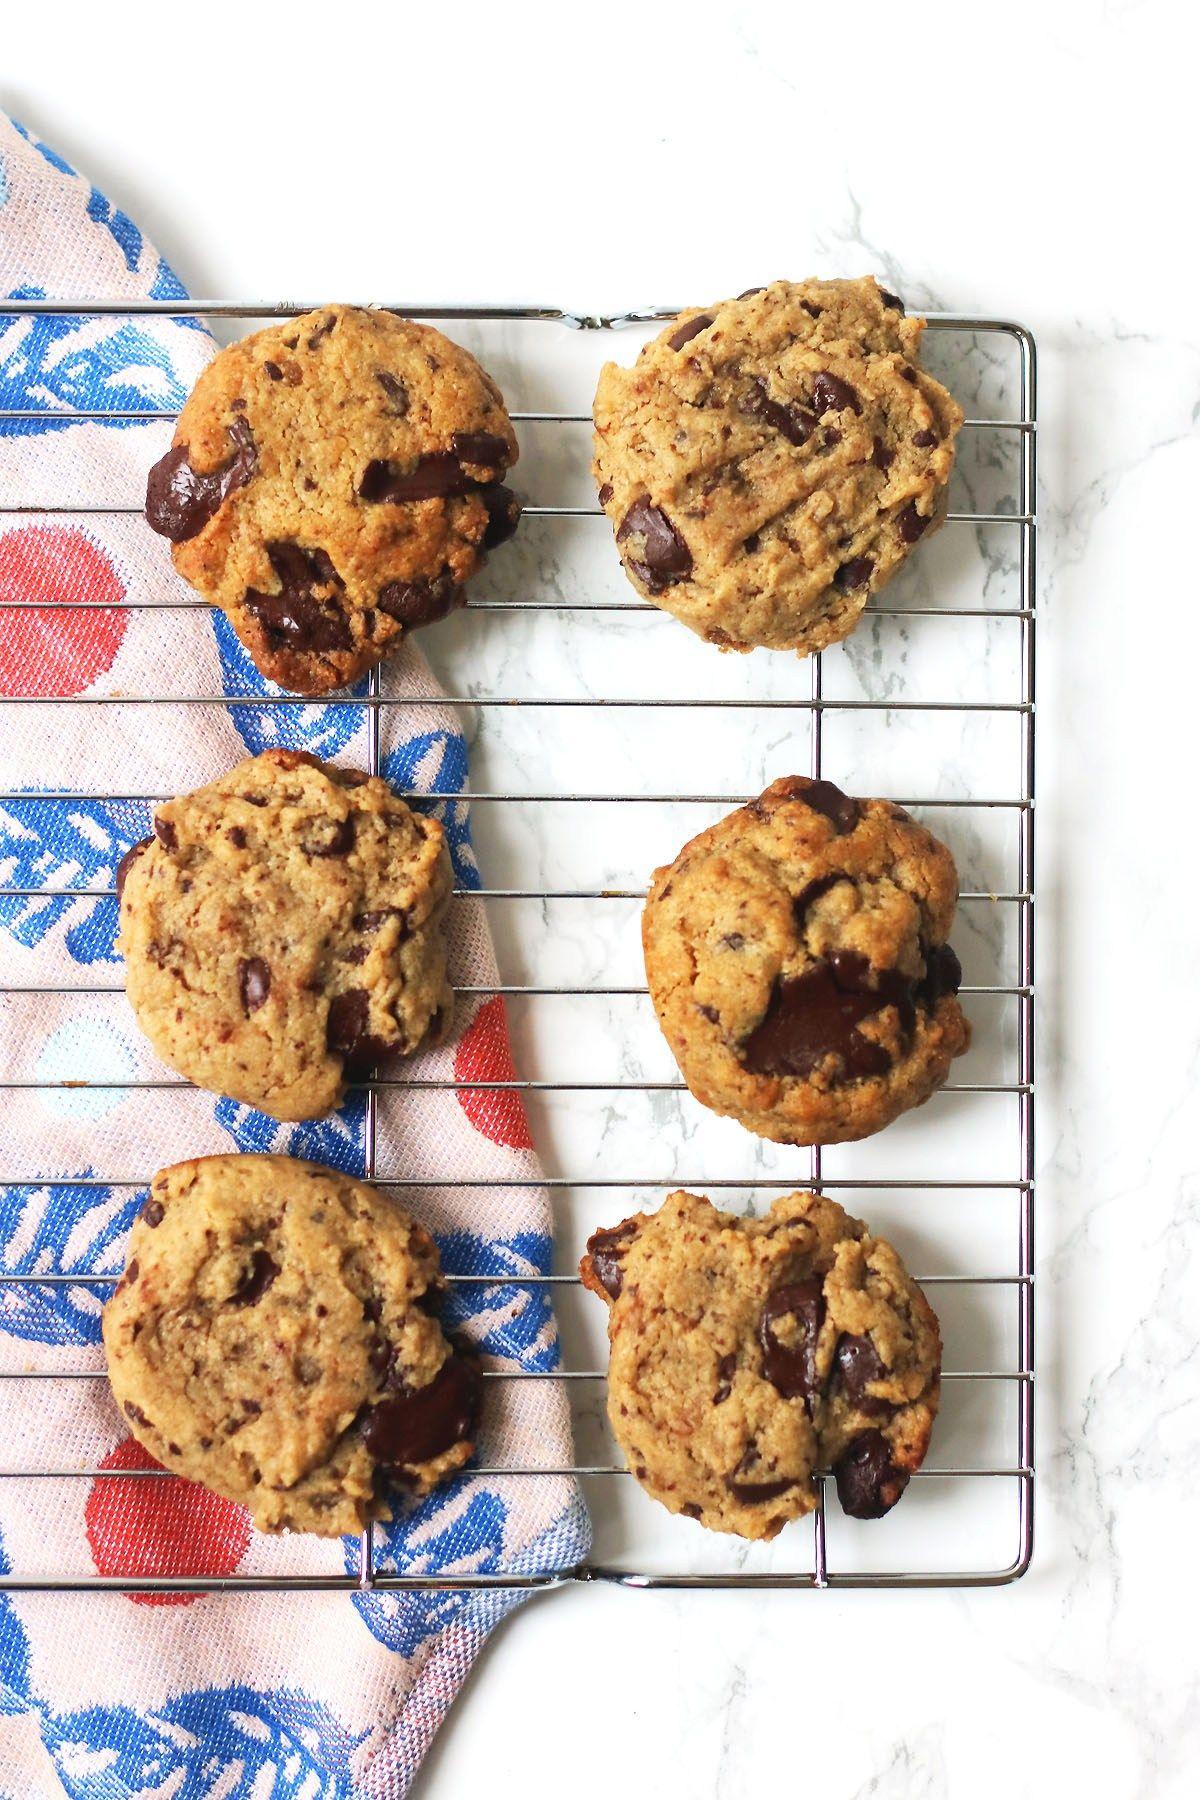 Vegan Chocolate Chip Cookies With Tahini And Sea Salt